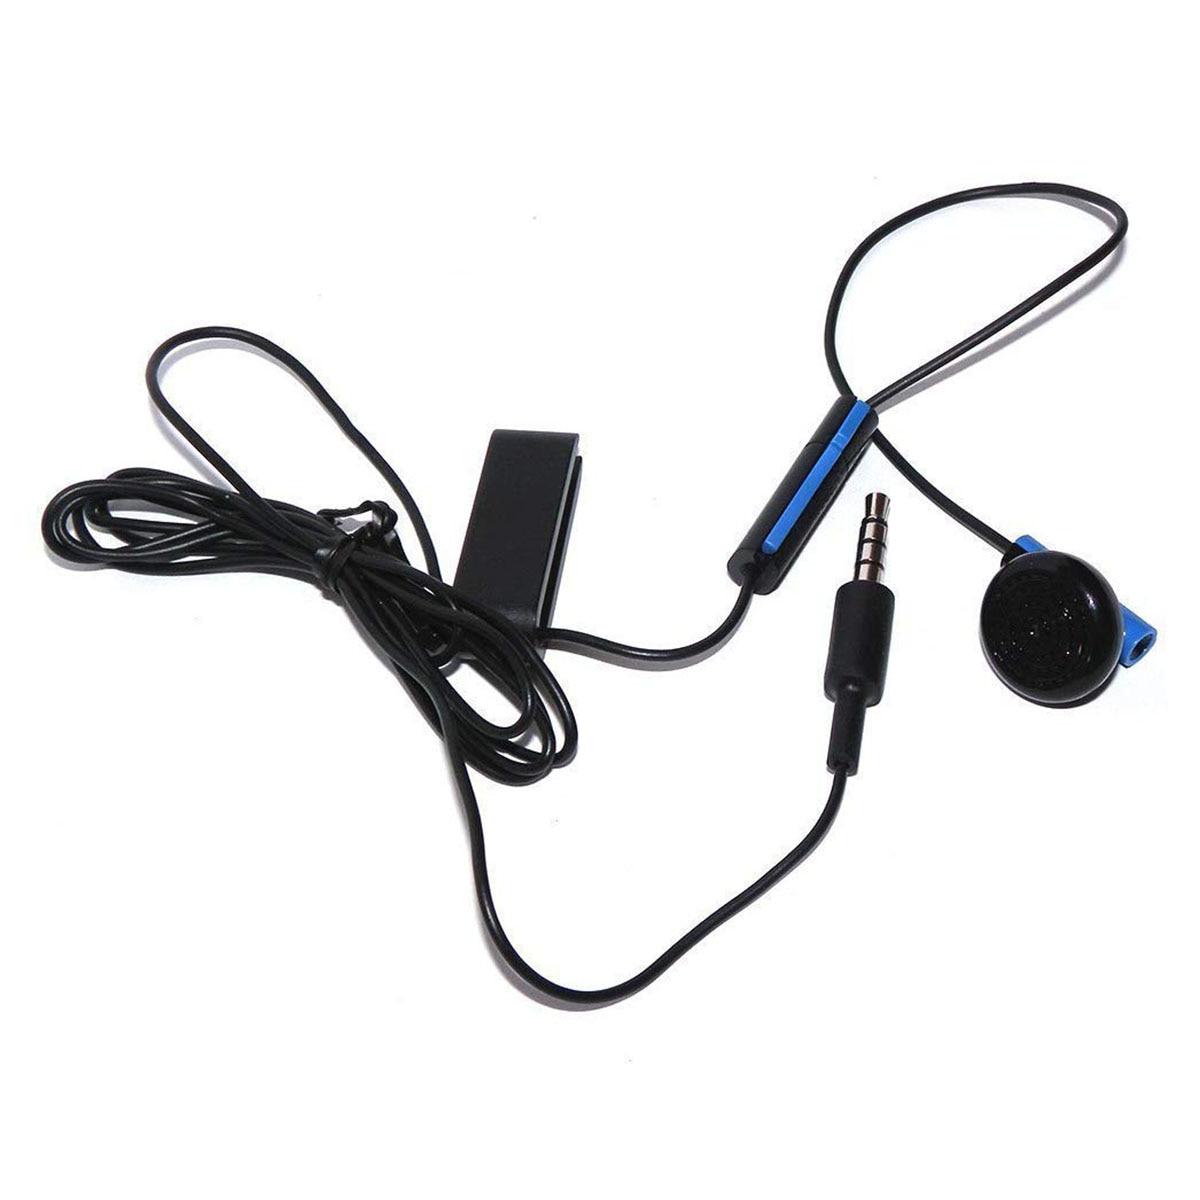 Headset Earbud Microphone Earpiece For PS4 Controller Headphones